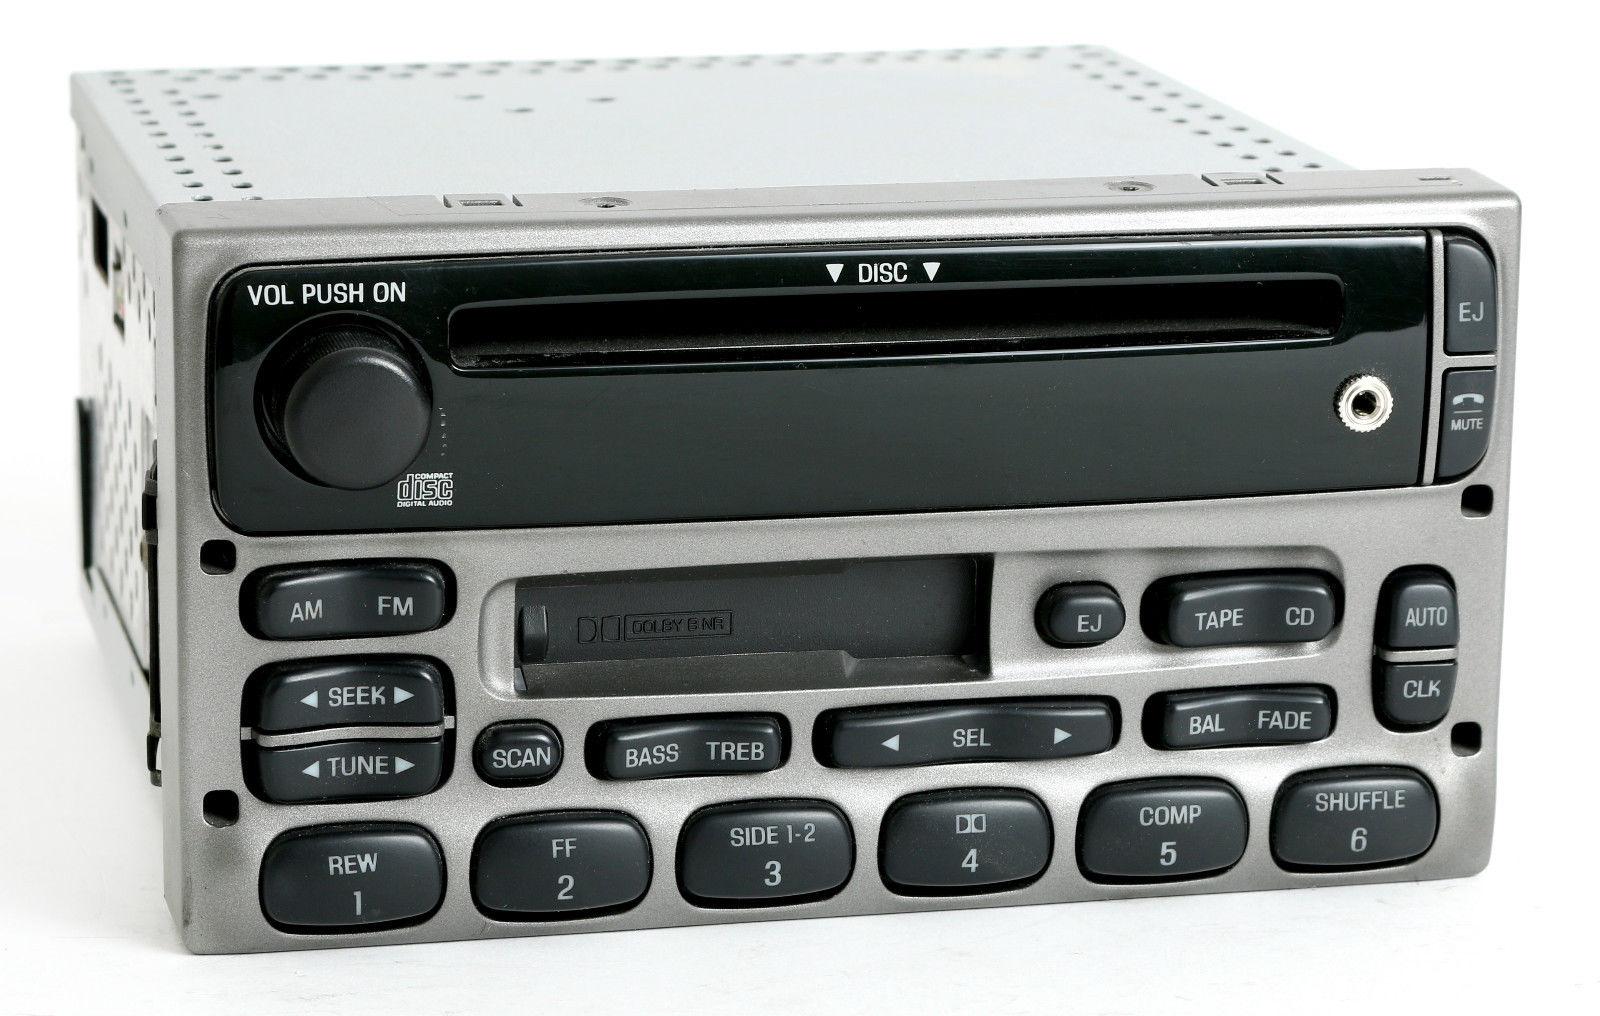 Ford 02 04 explorer sport trac radio amfm cd cassette w aux input 3l2t 18c868 bc 1 factory radio